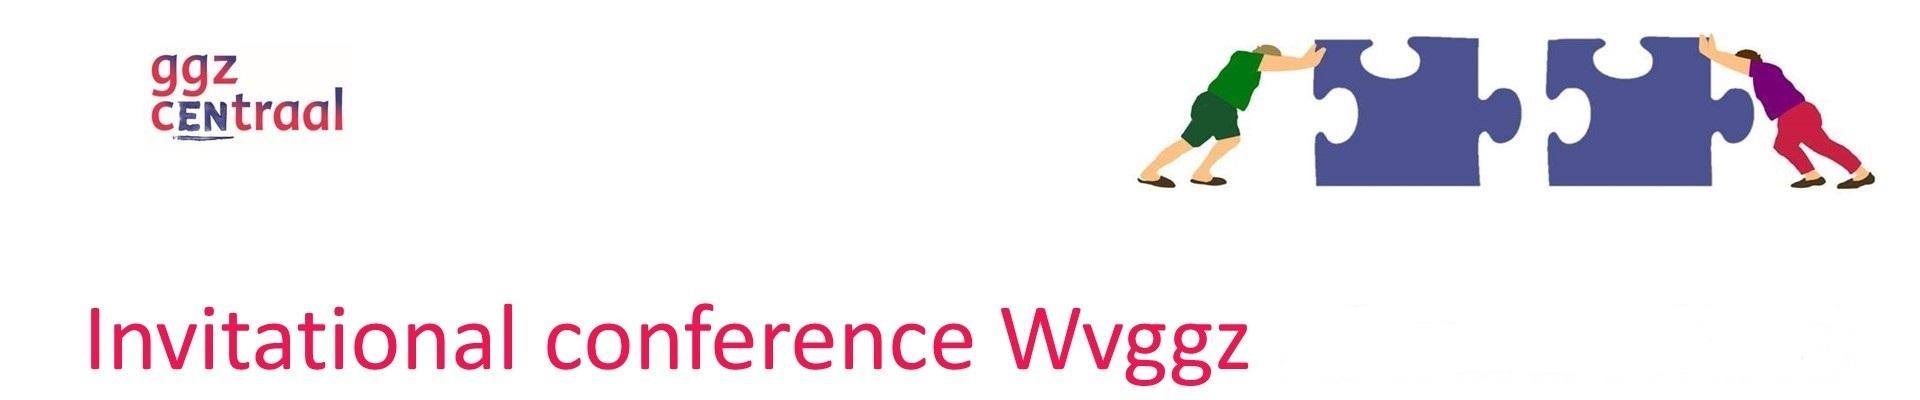 Invitational conference Wvggz 14 september